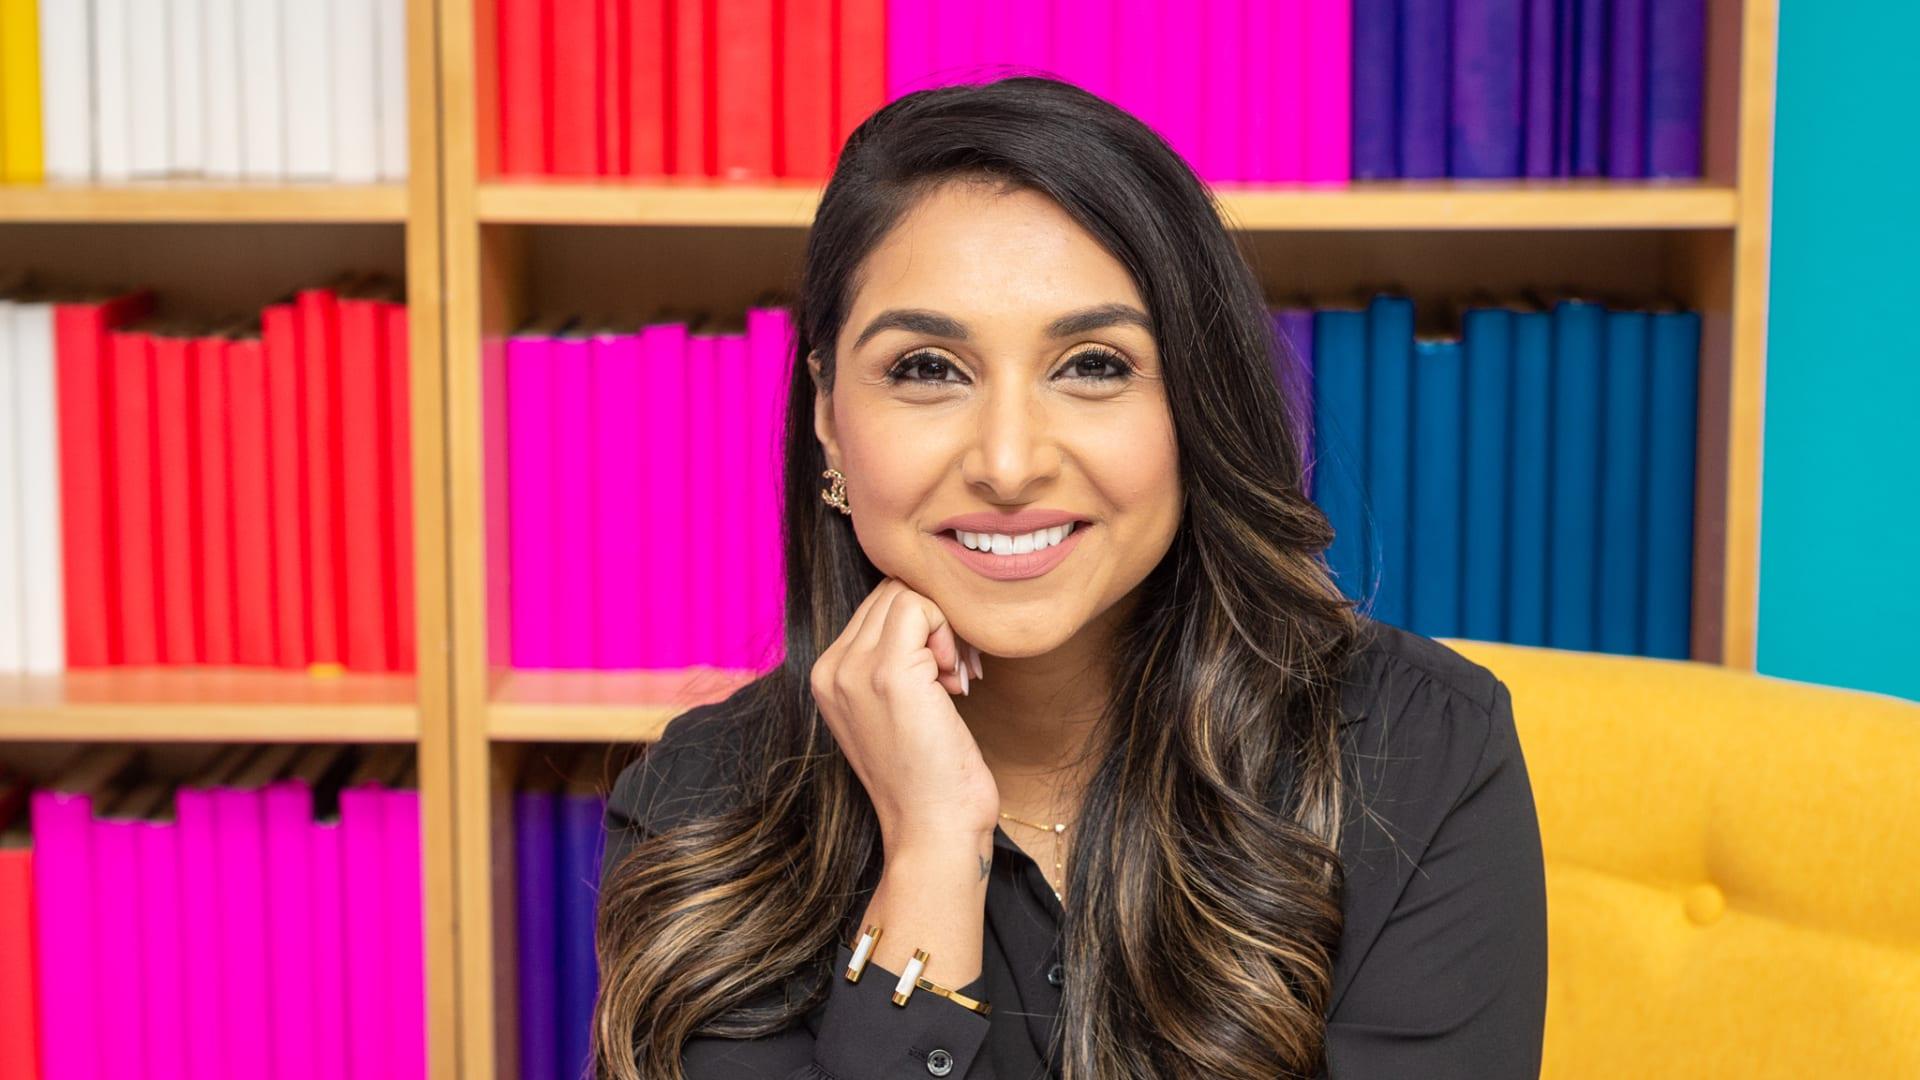 Suneera Madhani, founder of Stax.